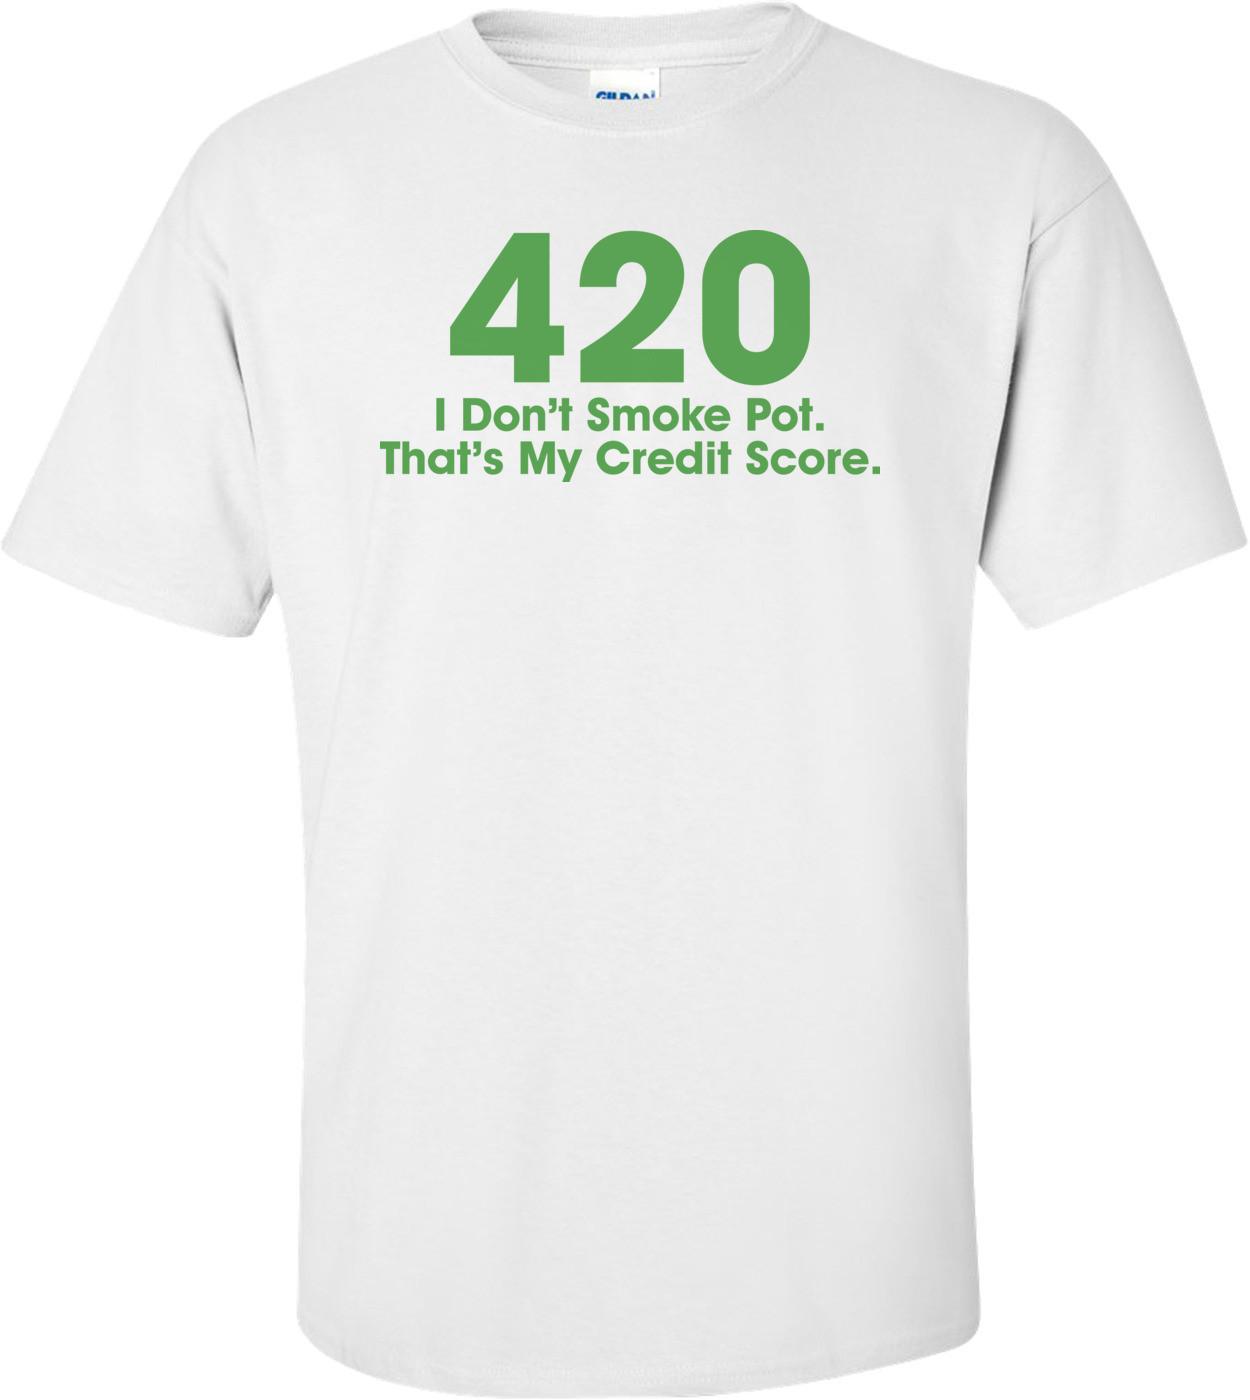 420 I Don't Smoke Pot That's My Credit Score